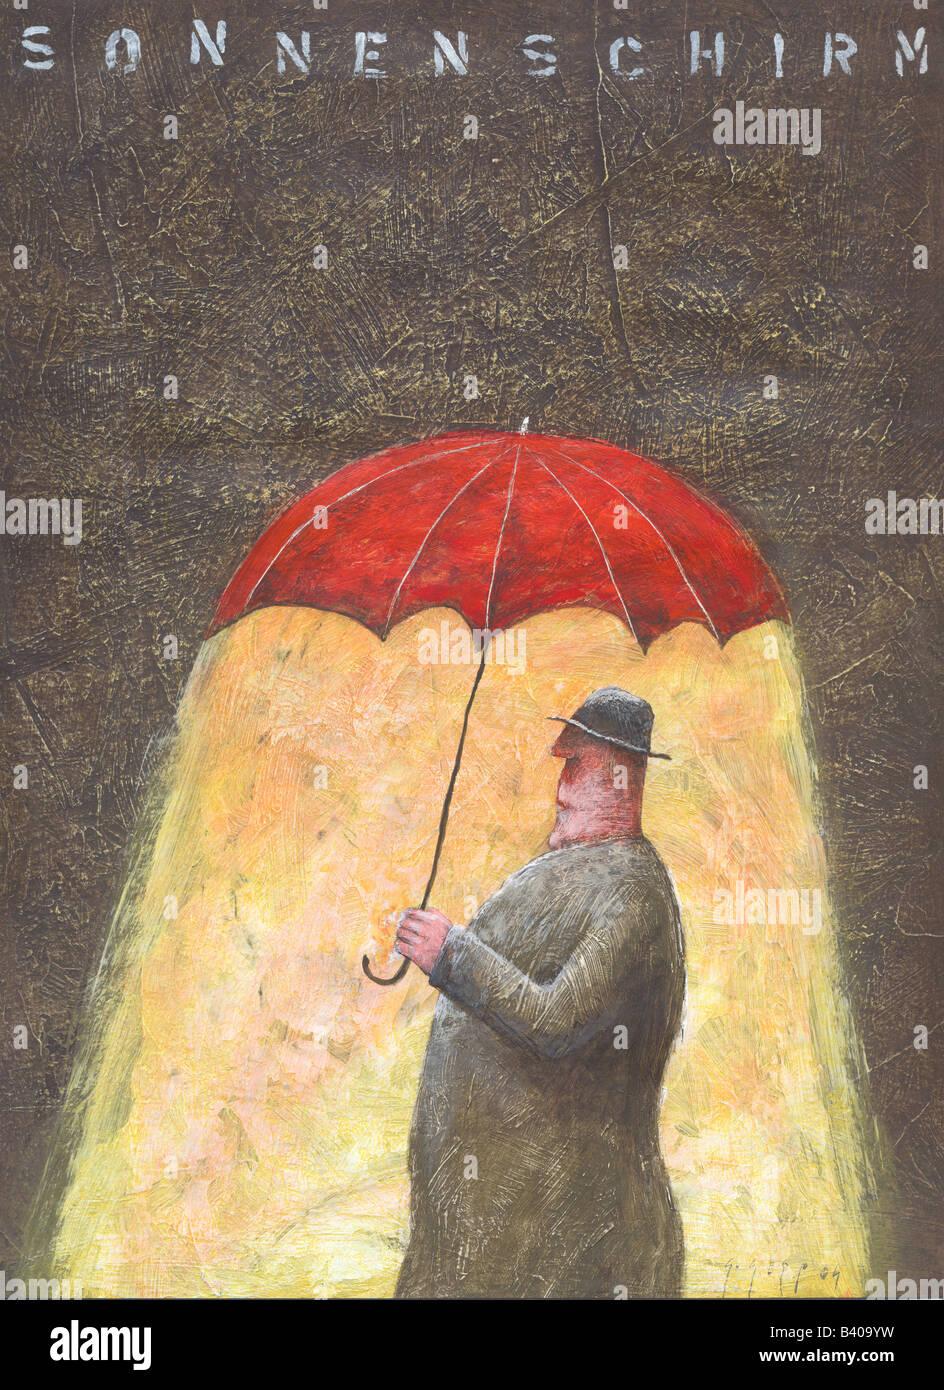 Sonnenschirm Regenschirm Stockbild